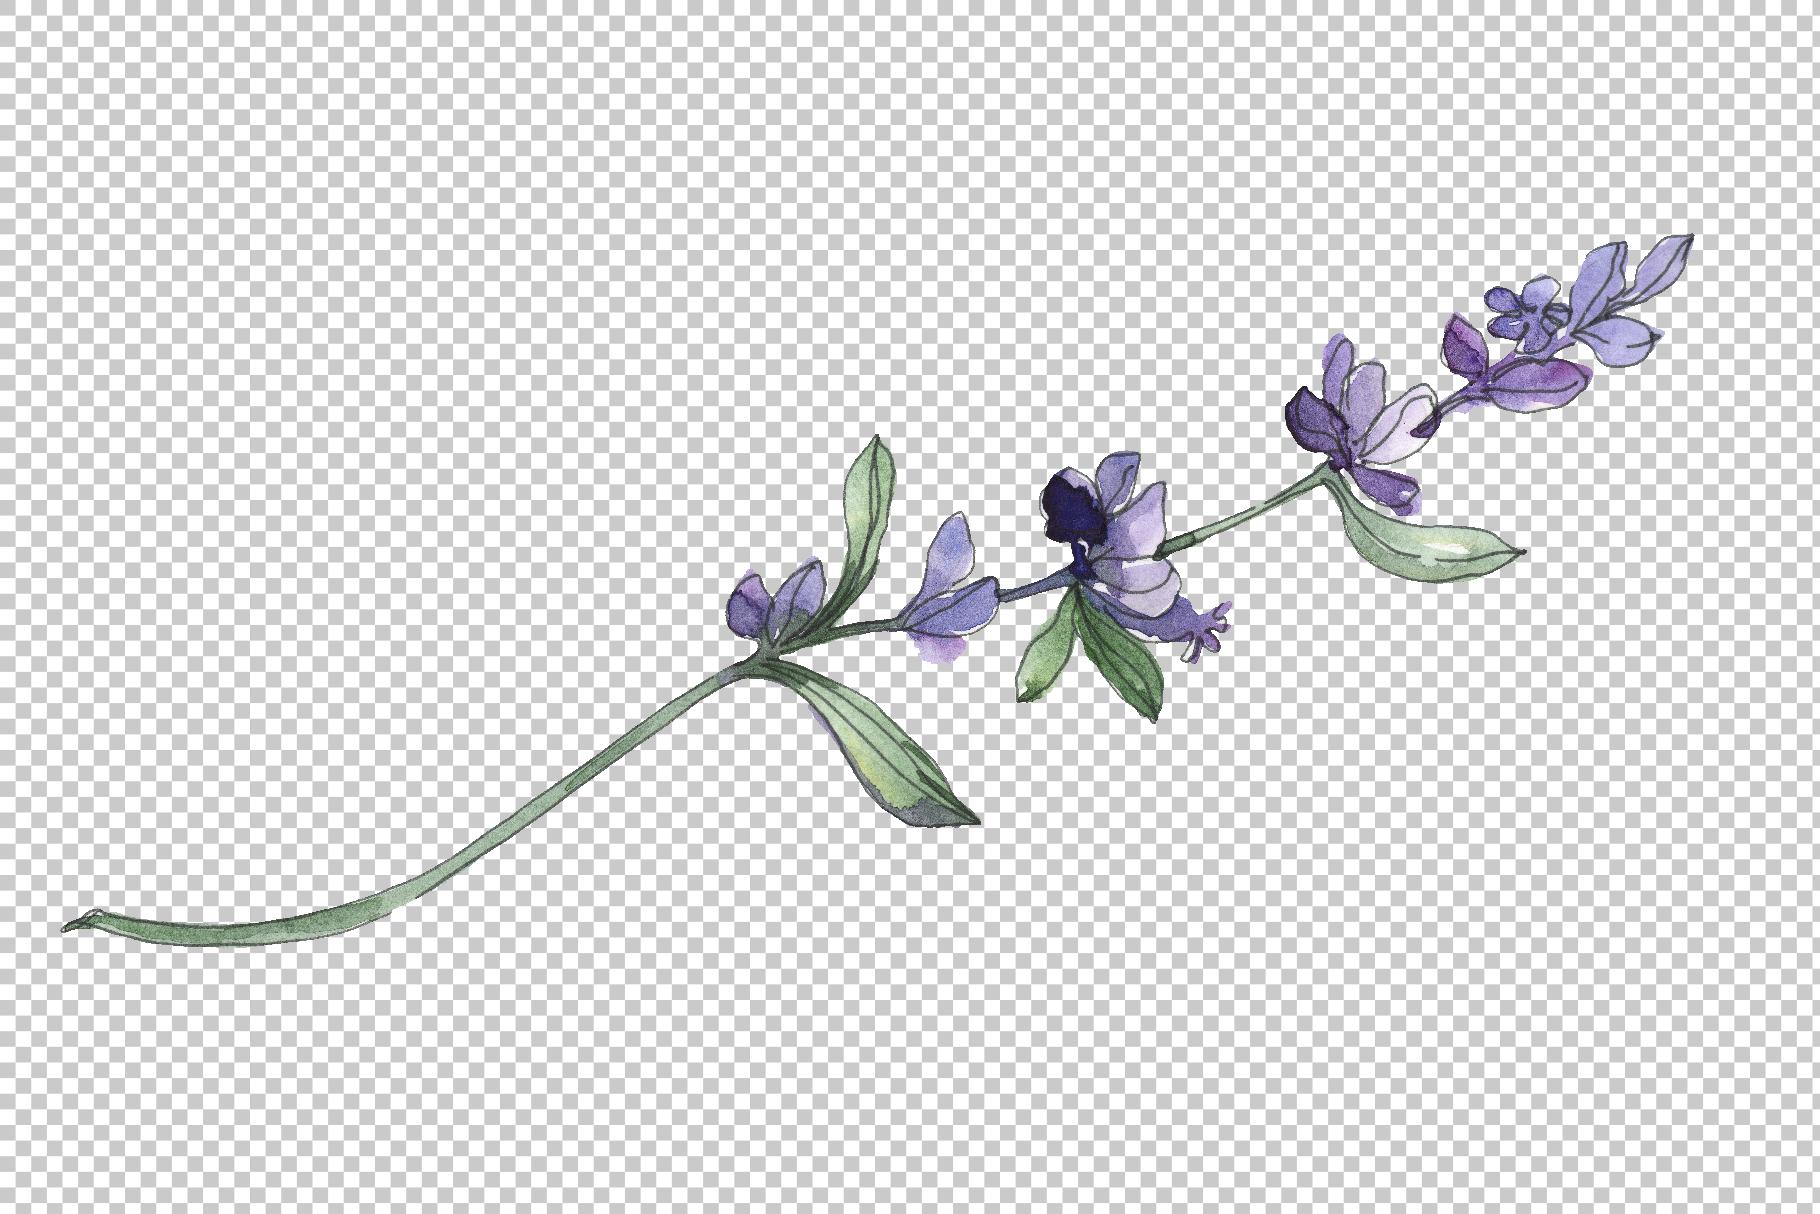 Bouquet summer breeze lavender watercolor png example image 5